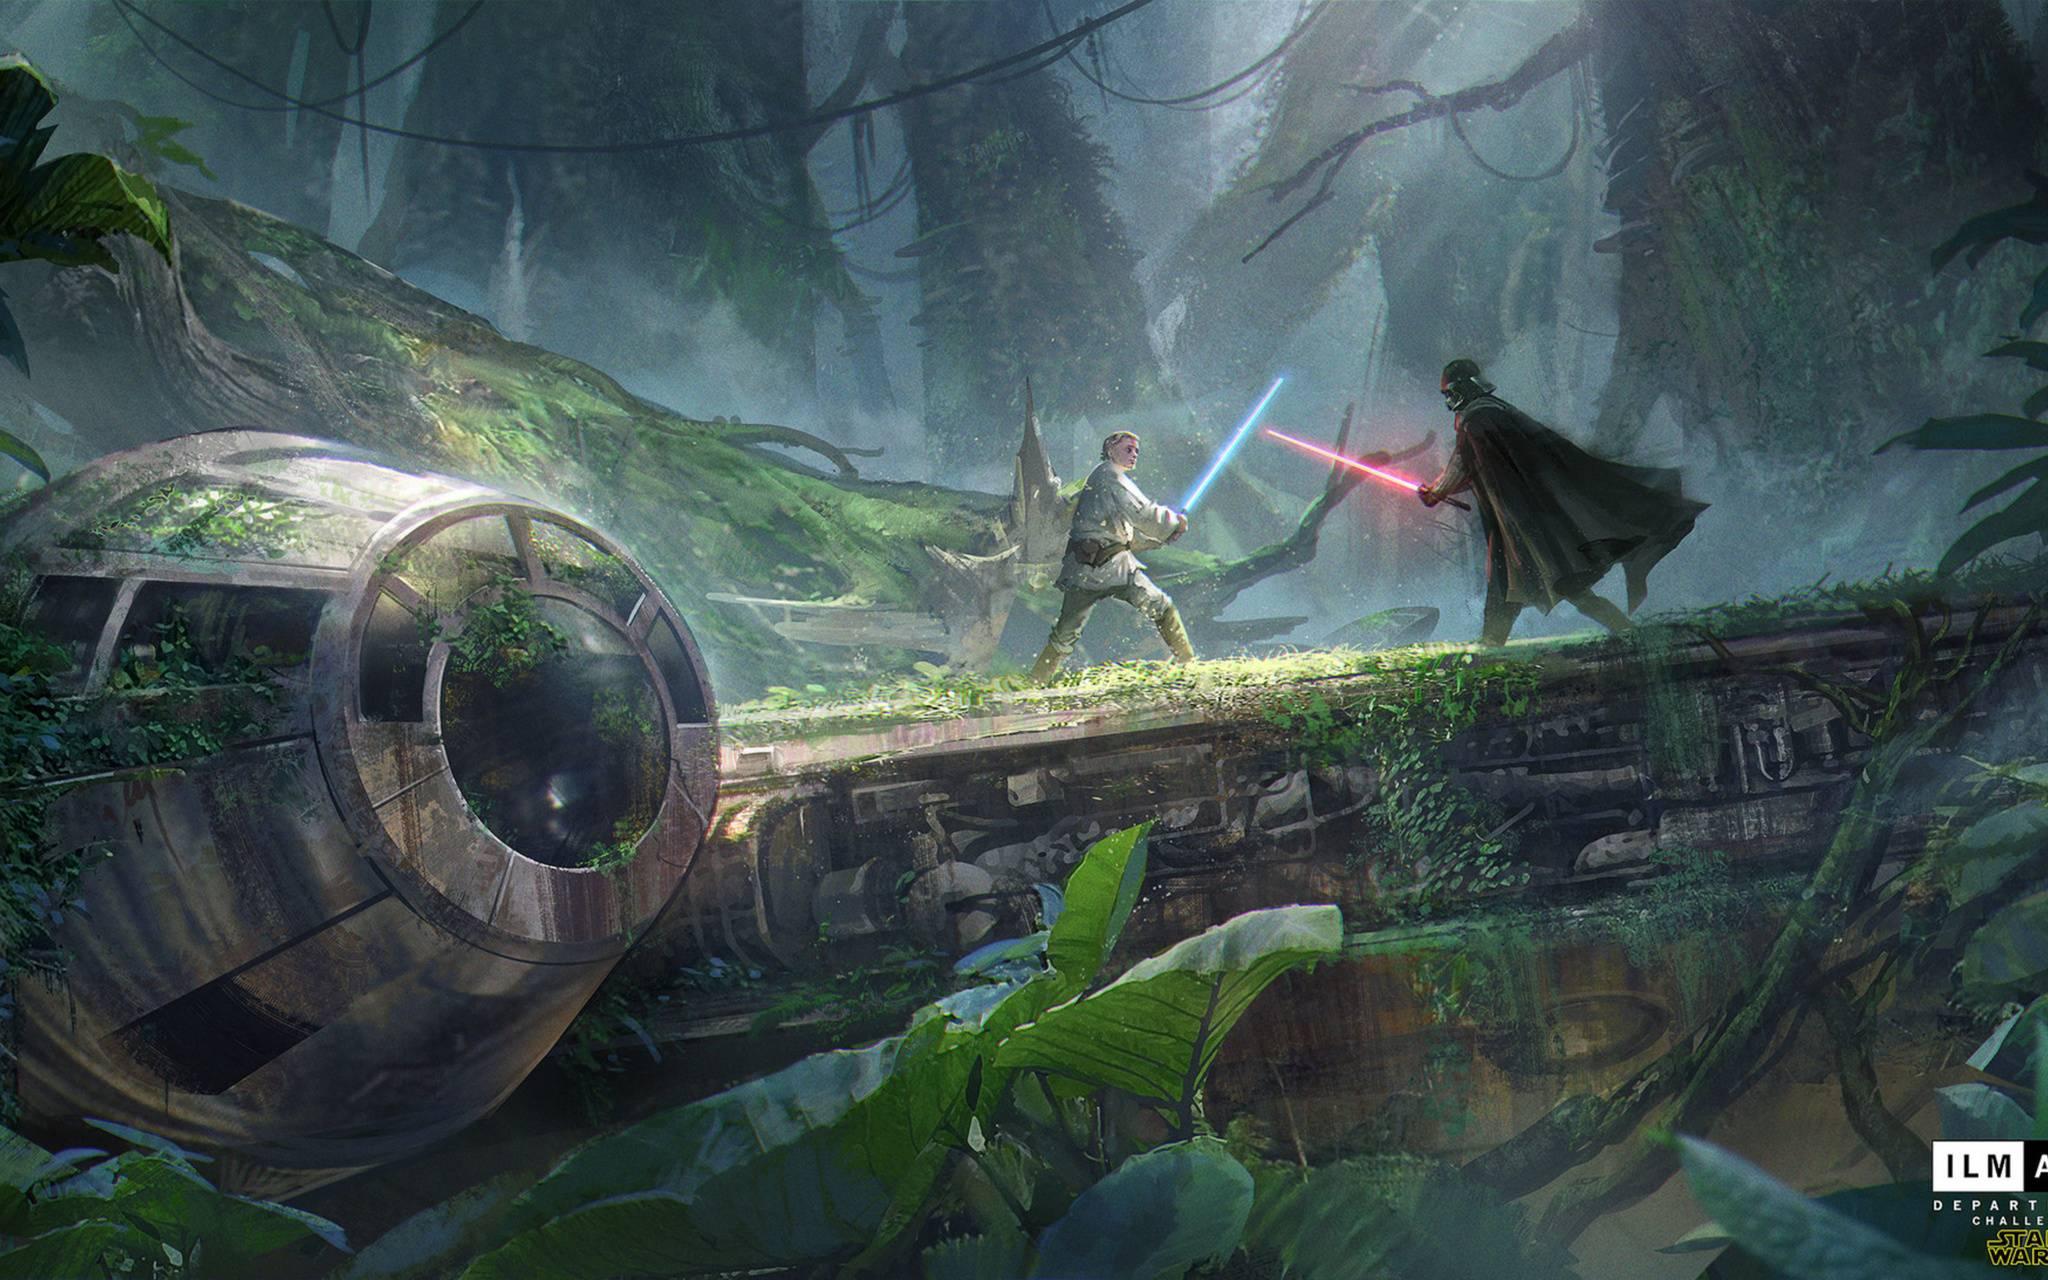 Luke Vs Darth Vader Wallpaper By Maniacboy777 C8 Free On Zedge